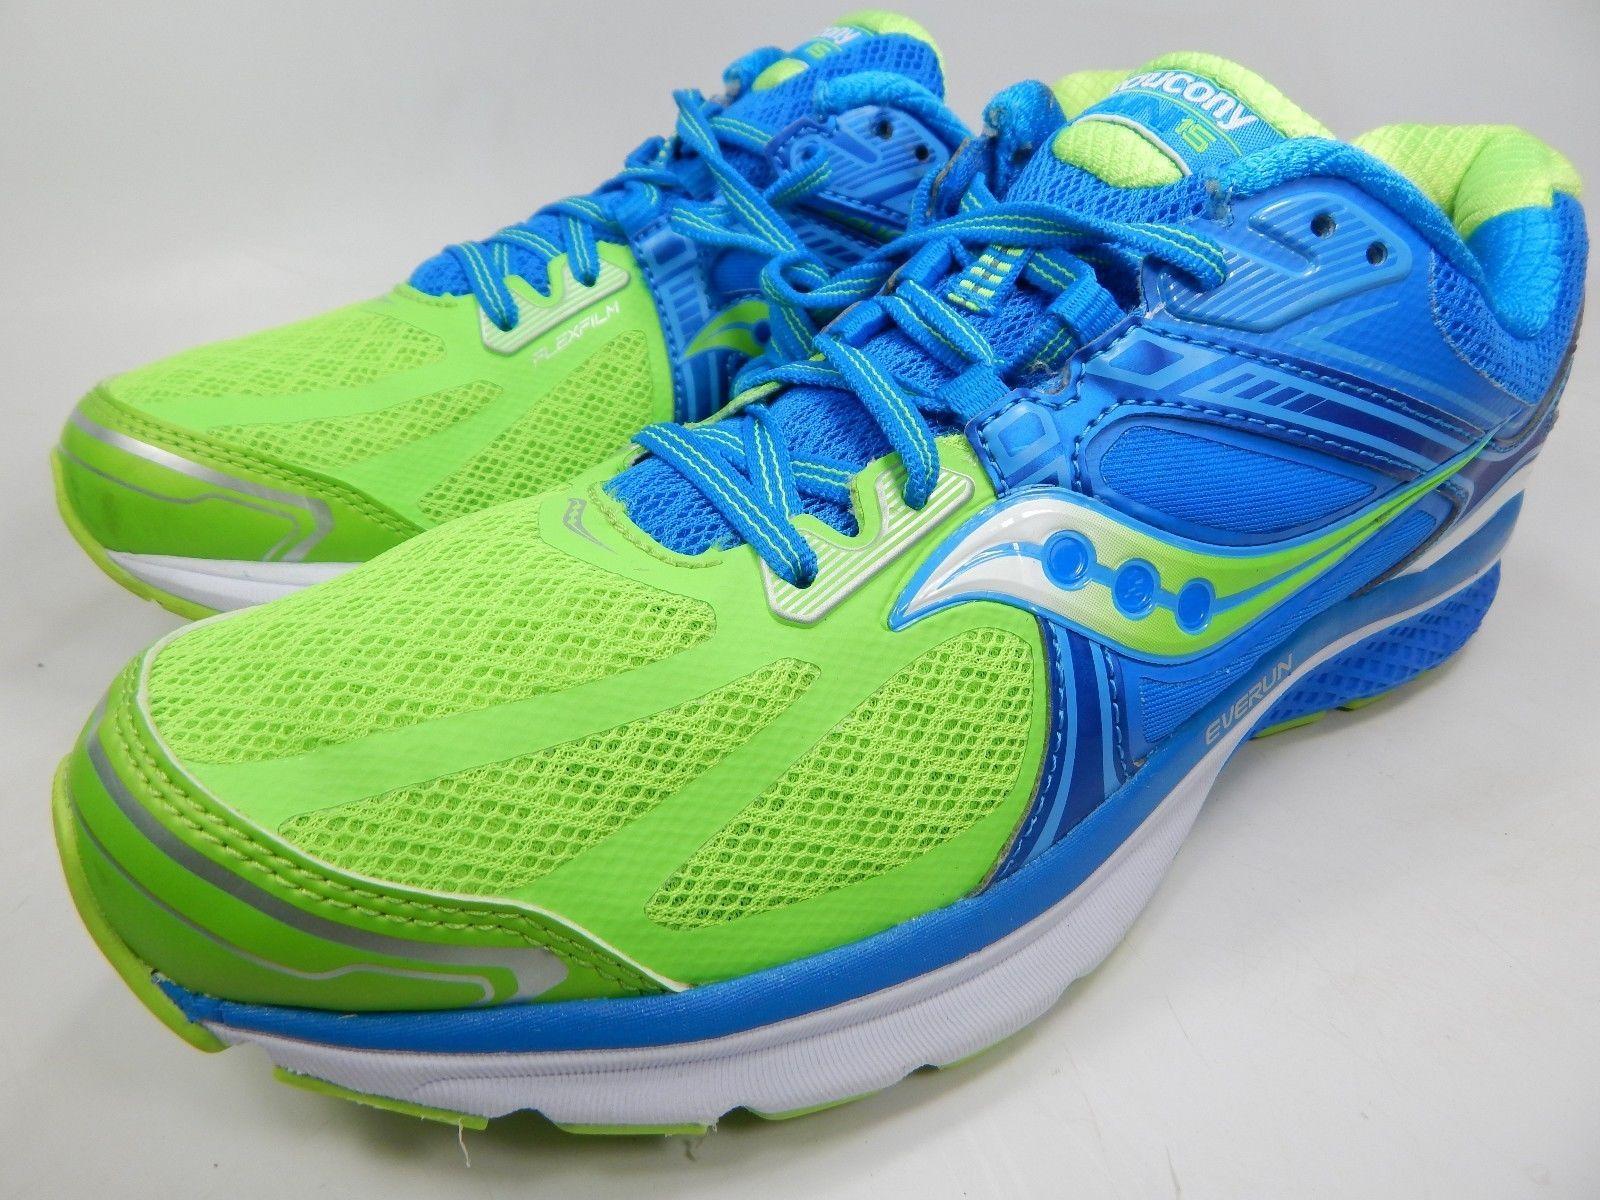 Saucony Omni 15 Women's Running Shoes Size US 11.5 M (B) EU 44 Blue S10315-2